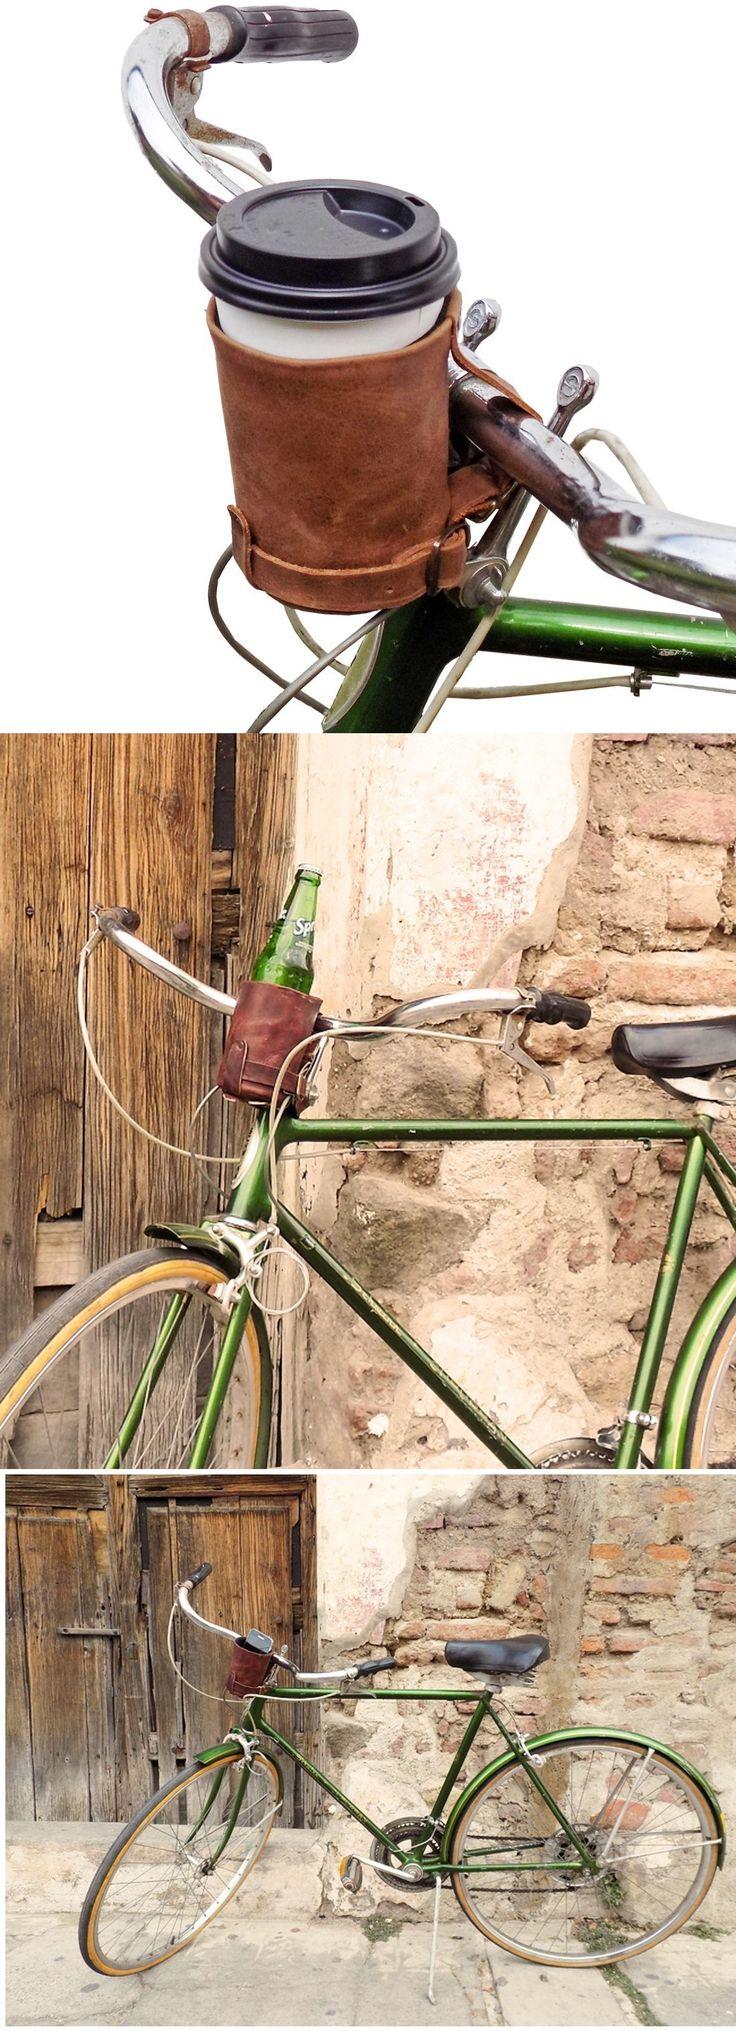 cruzy-kuzy-leather-bike-cup-holder-handmade